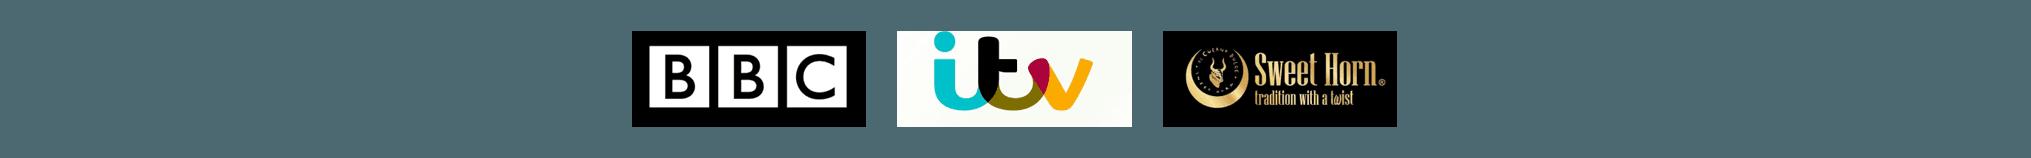 BBC itv logos